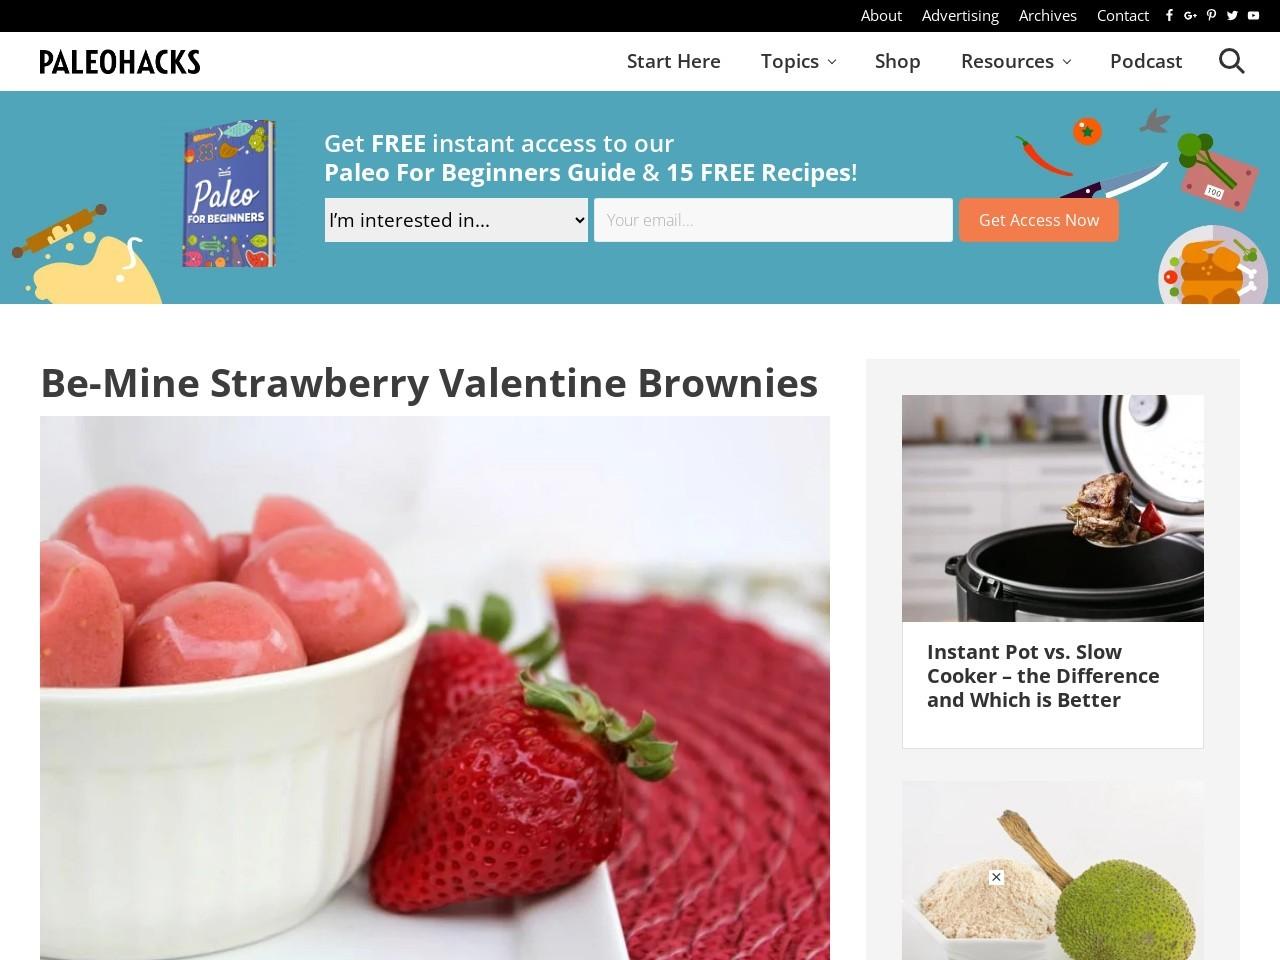 Be-Mine Strawberry Valentine Brownies